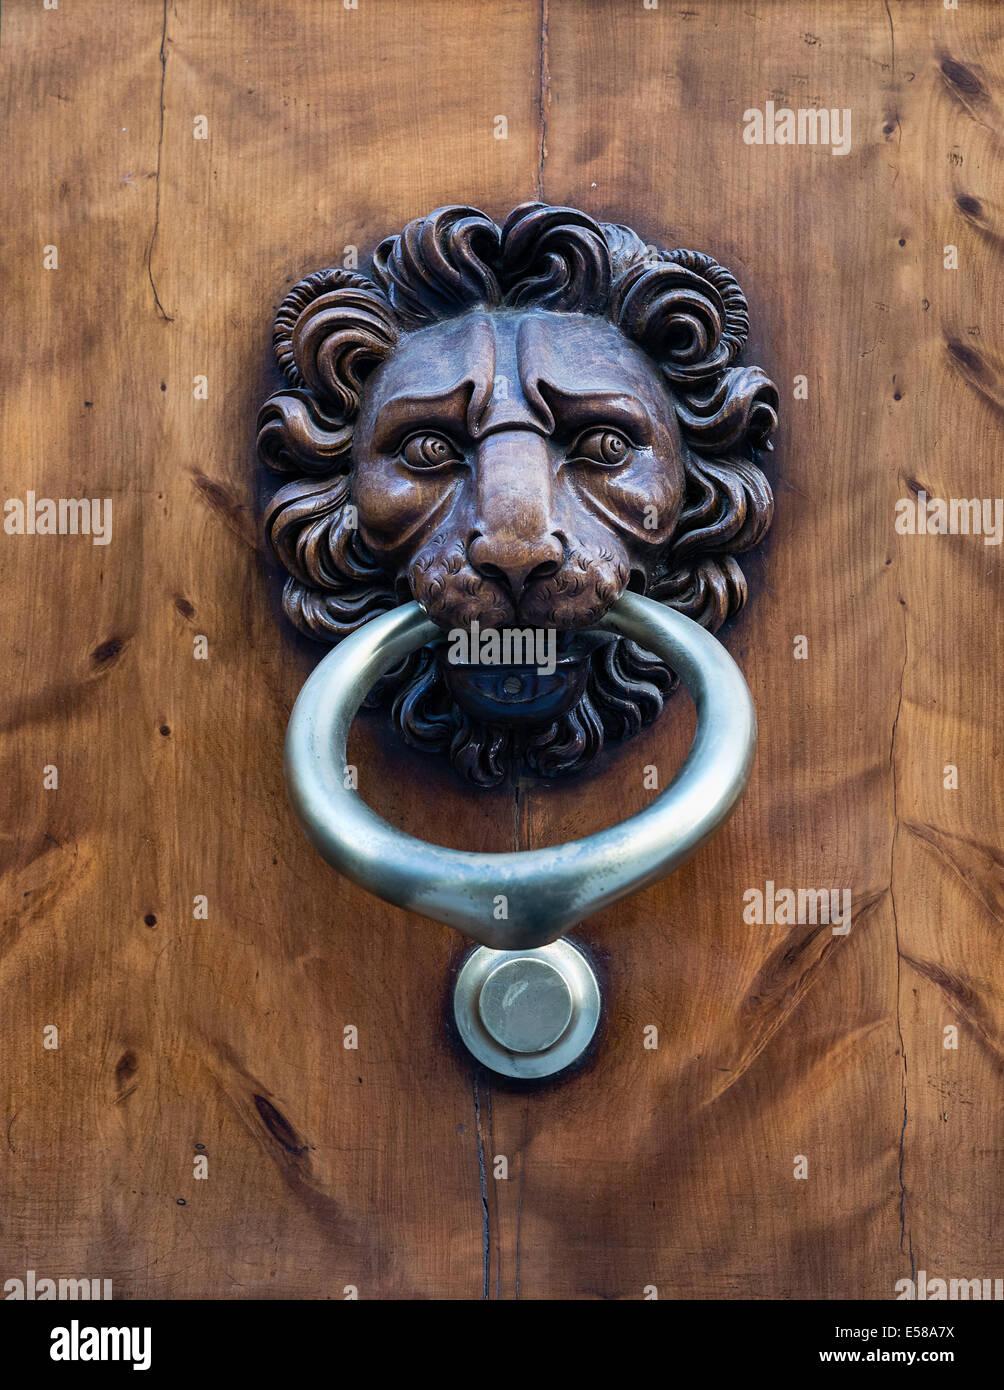 Decorative Lion Door Knocker, Florence, Italy Stock Photo ...